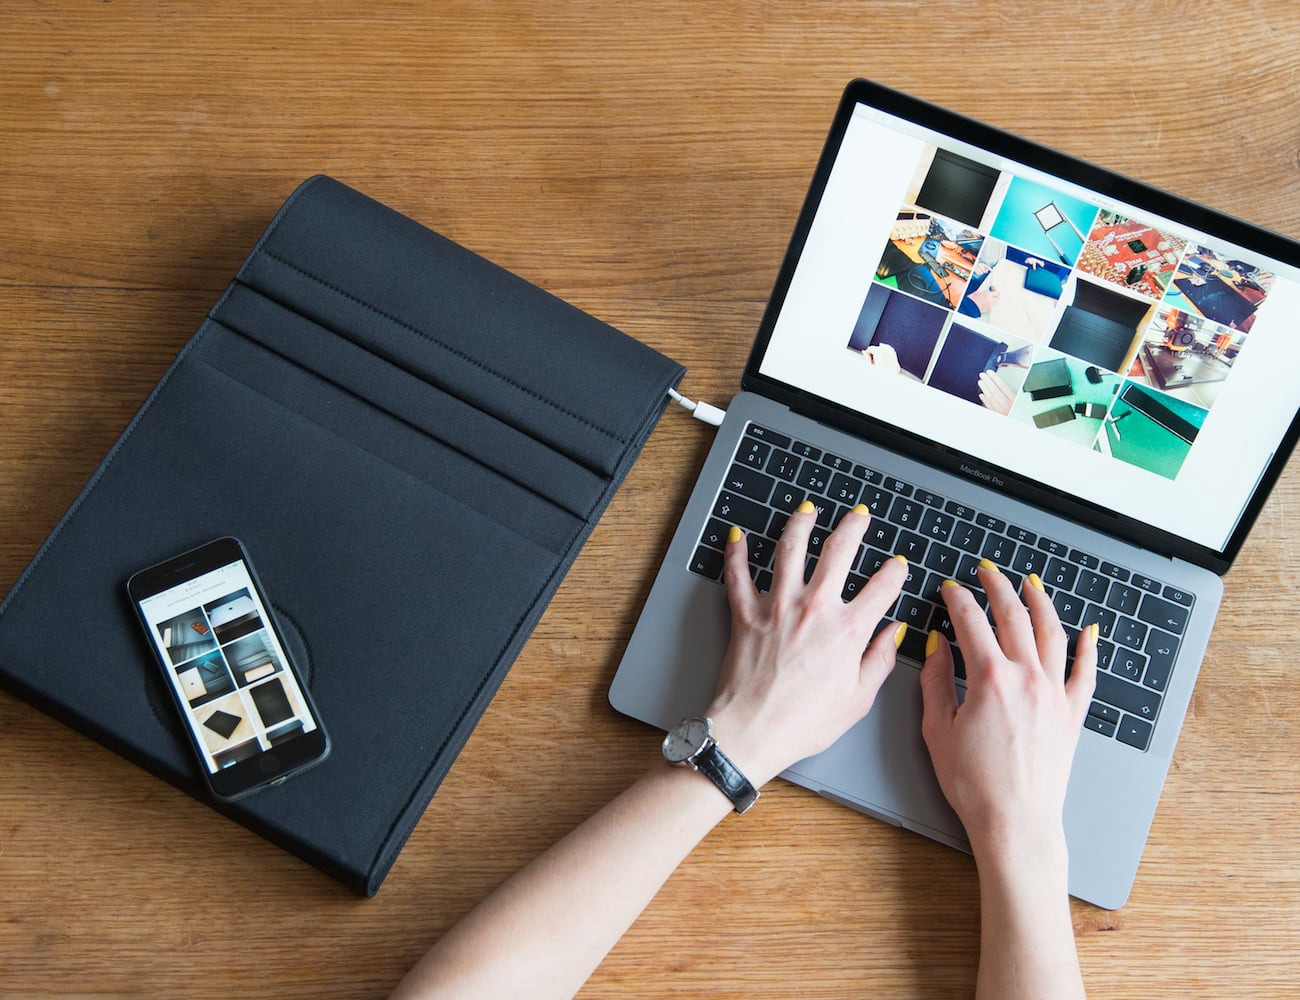 Come trasportare un MacBook in sicurezza? 2